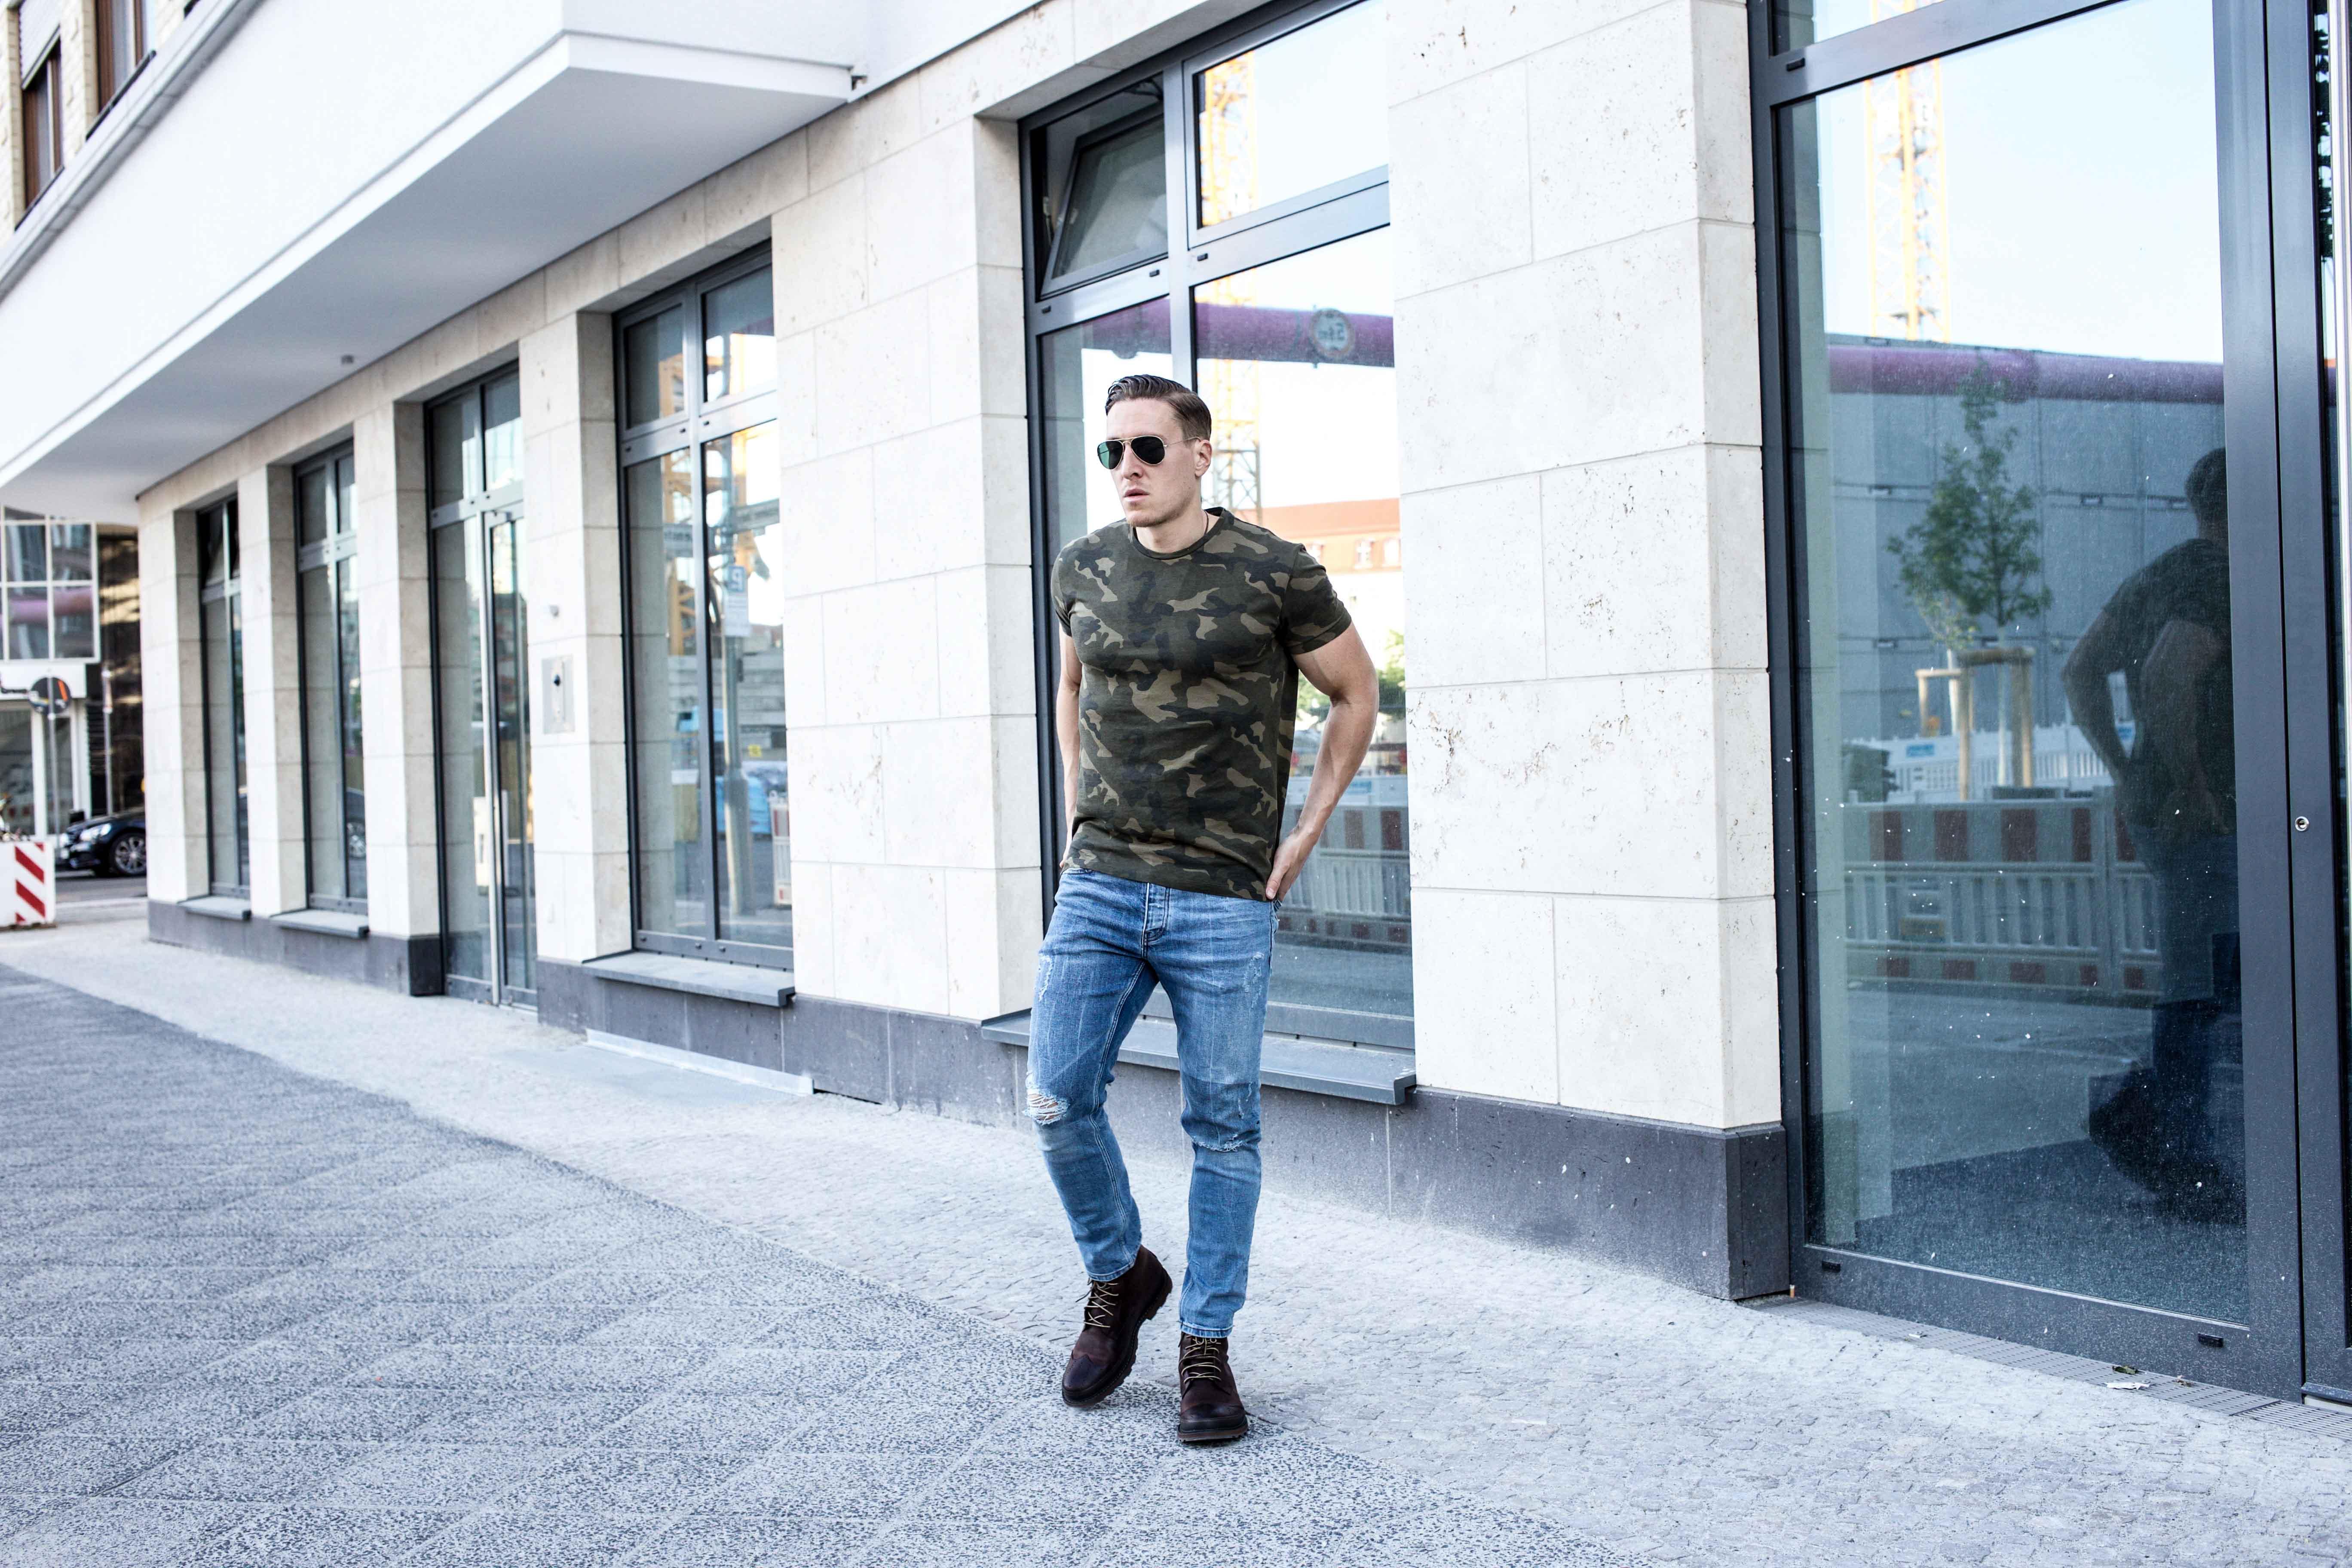 camouflage-braun-erdtöne-boots-ripped-jeans-männer-lifestyle-modeblog_6882